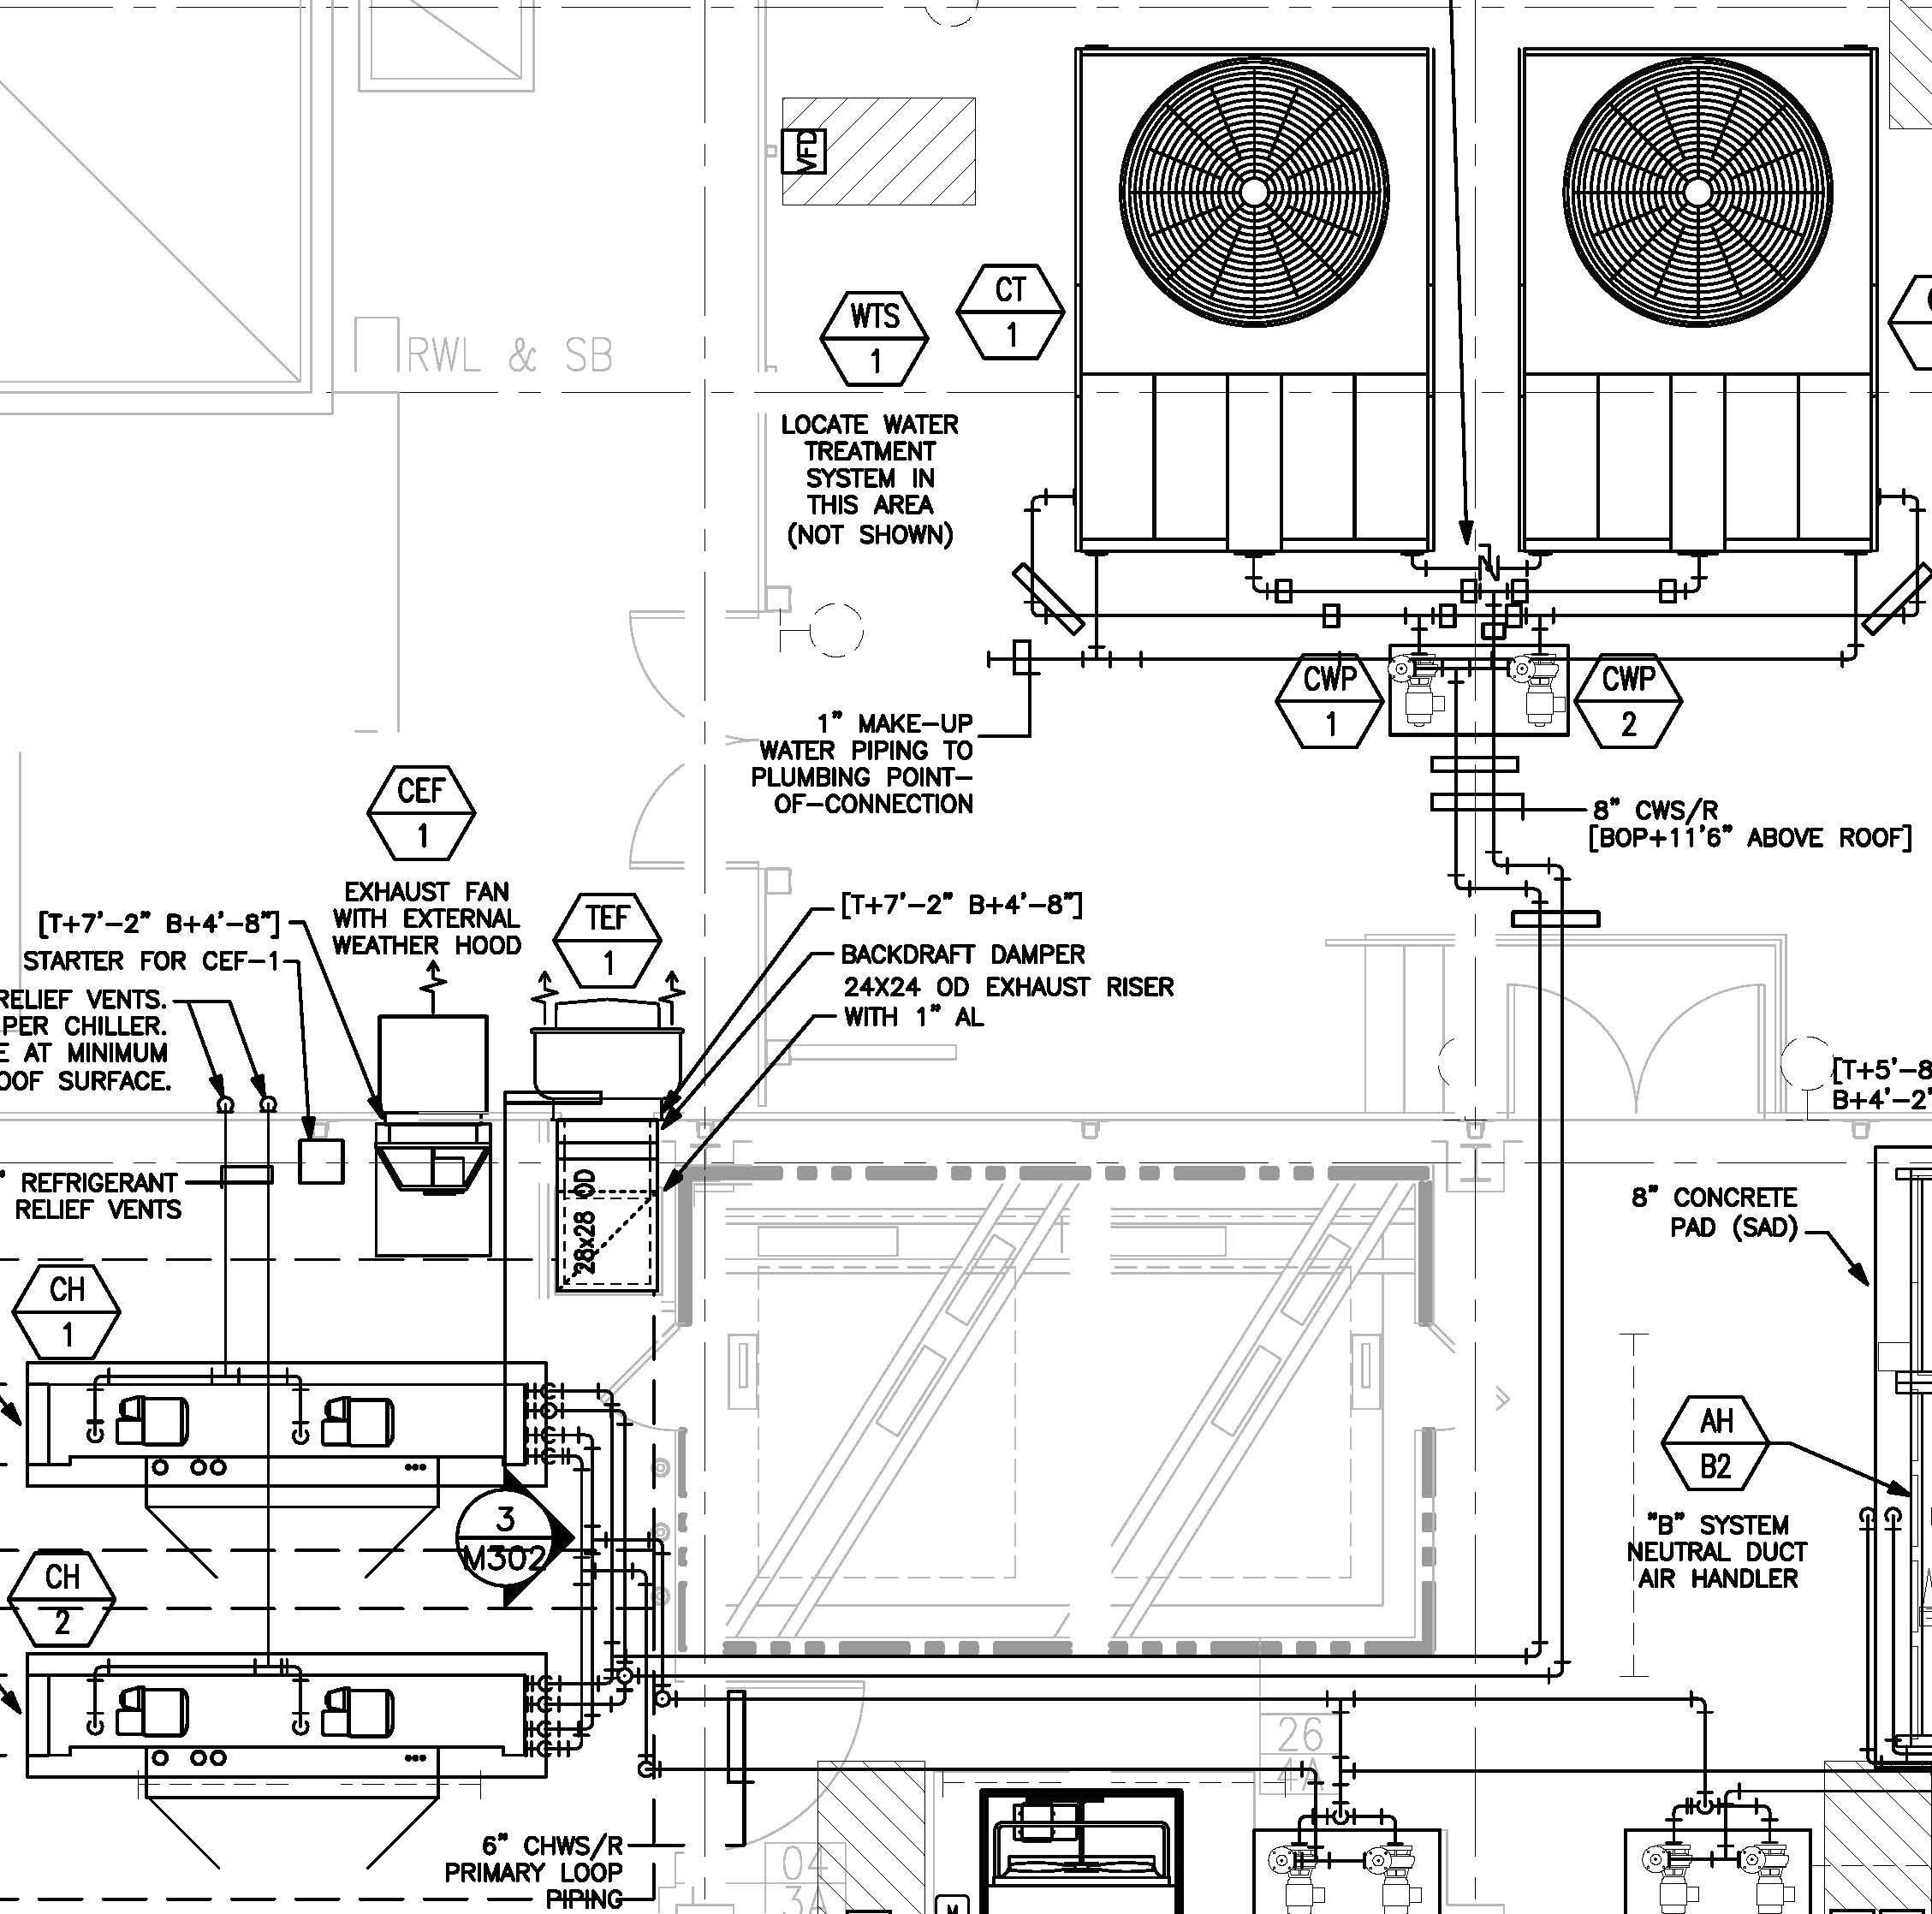 Diagram Of Car Controls Hvac Control Wiring Diagram New Wiring Diagrams for Hvac New Wiring Of Diagram Of Car Controls